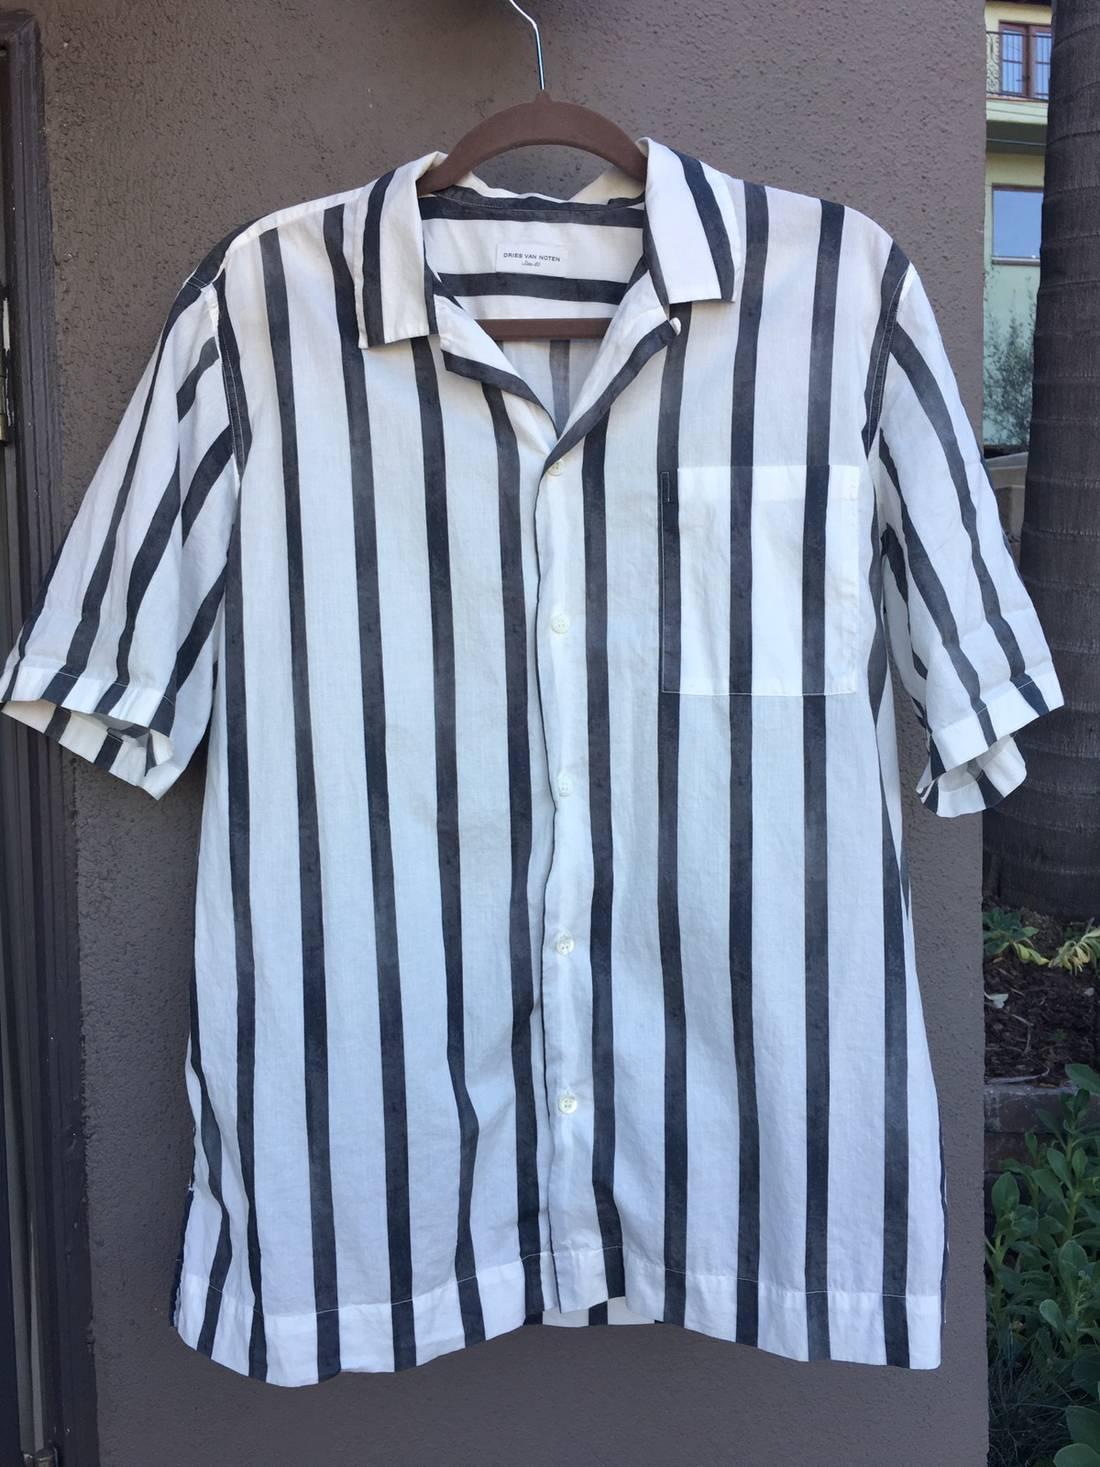 Low Shipping Discount Ebay Dries Van Noten Silk Short Sleeve Top Sale Collections mK86Ko